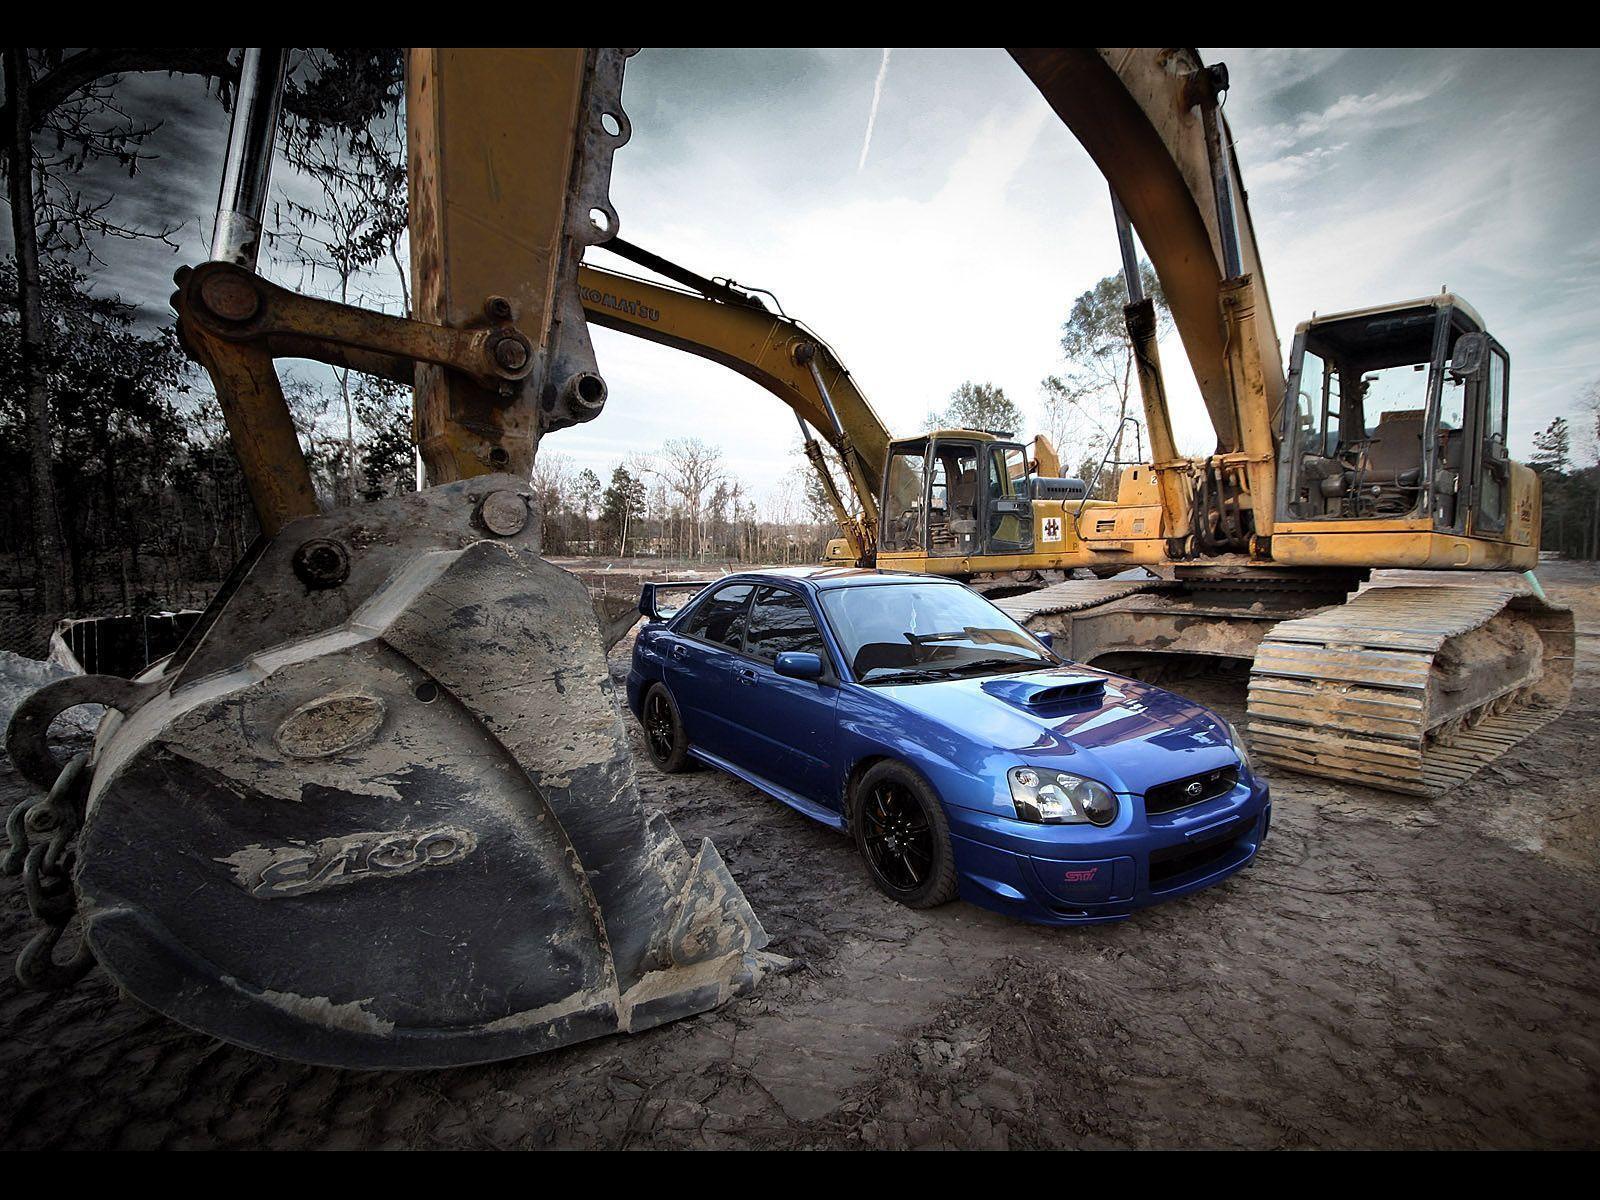 Subaru Sti Wallpapers Wallpaper Cave